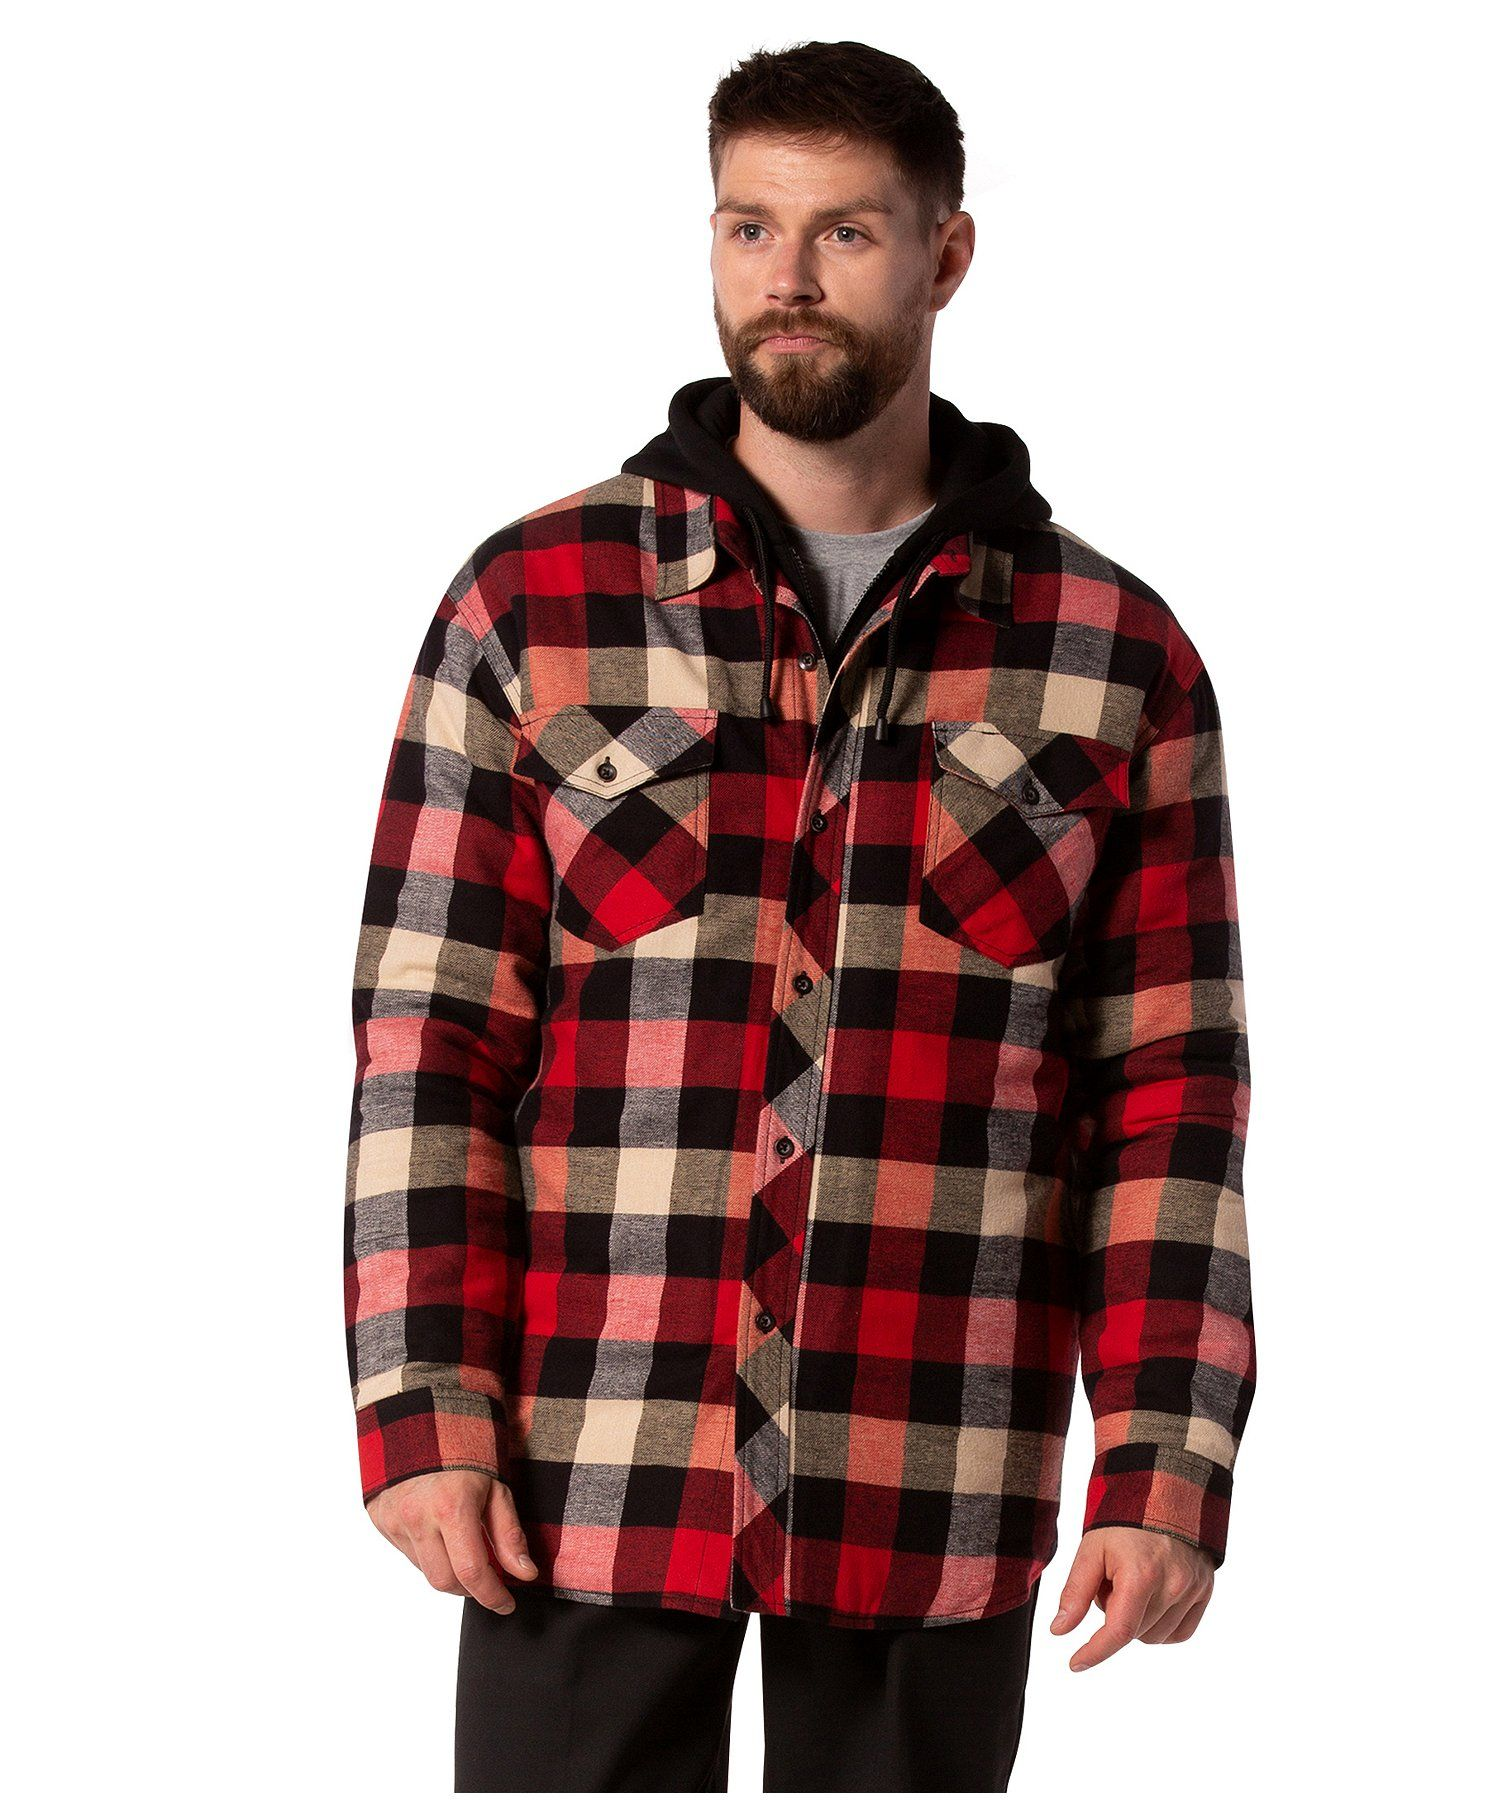 Dakota Plaid Hooded Quilted Flannel Shirt Quilted Flannel Shirt Flannel Shirt Women S Plaid Shirt [ 1800 x 1488 Pixel ]